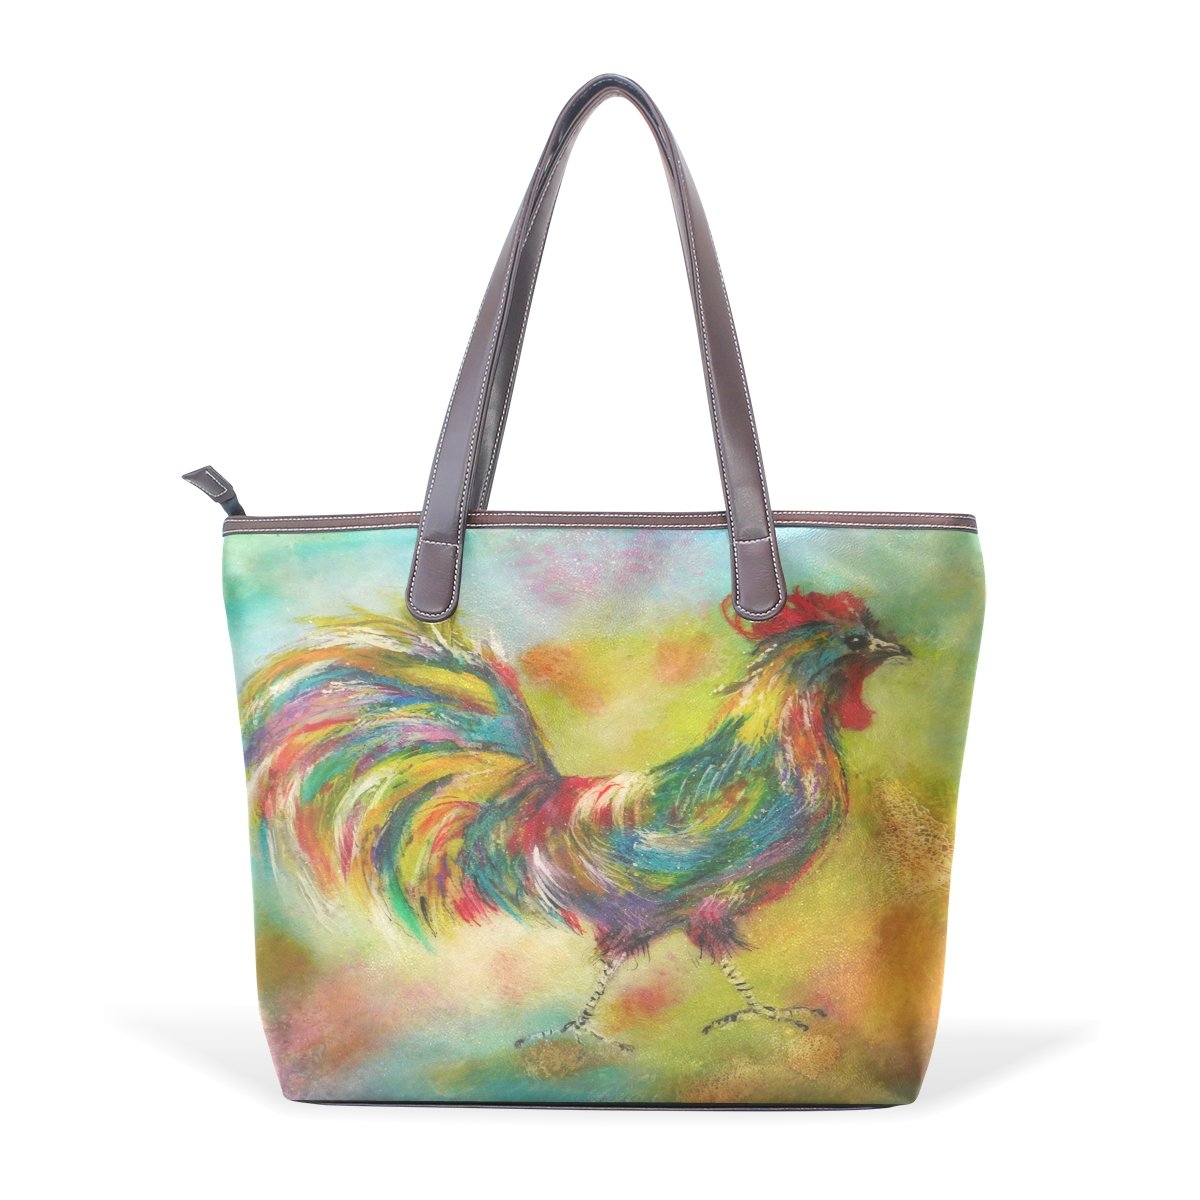 Ye Store Painting The Cock Lady PU Leather Handbag Tote Bag Shoulder Bag Shopping Bag